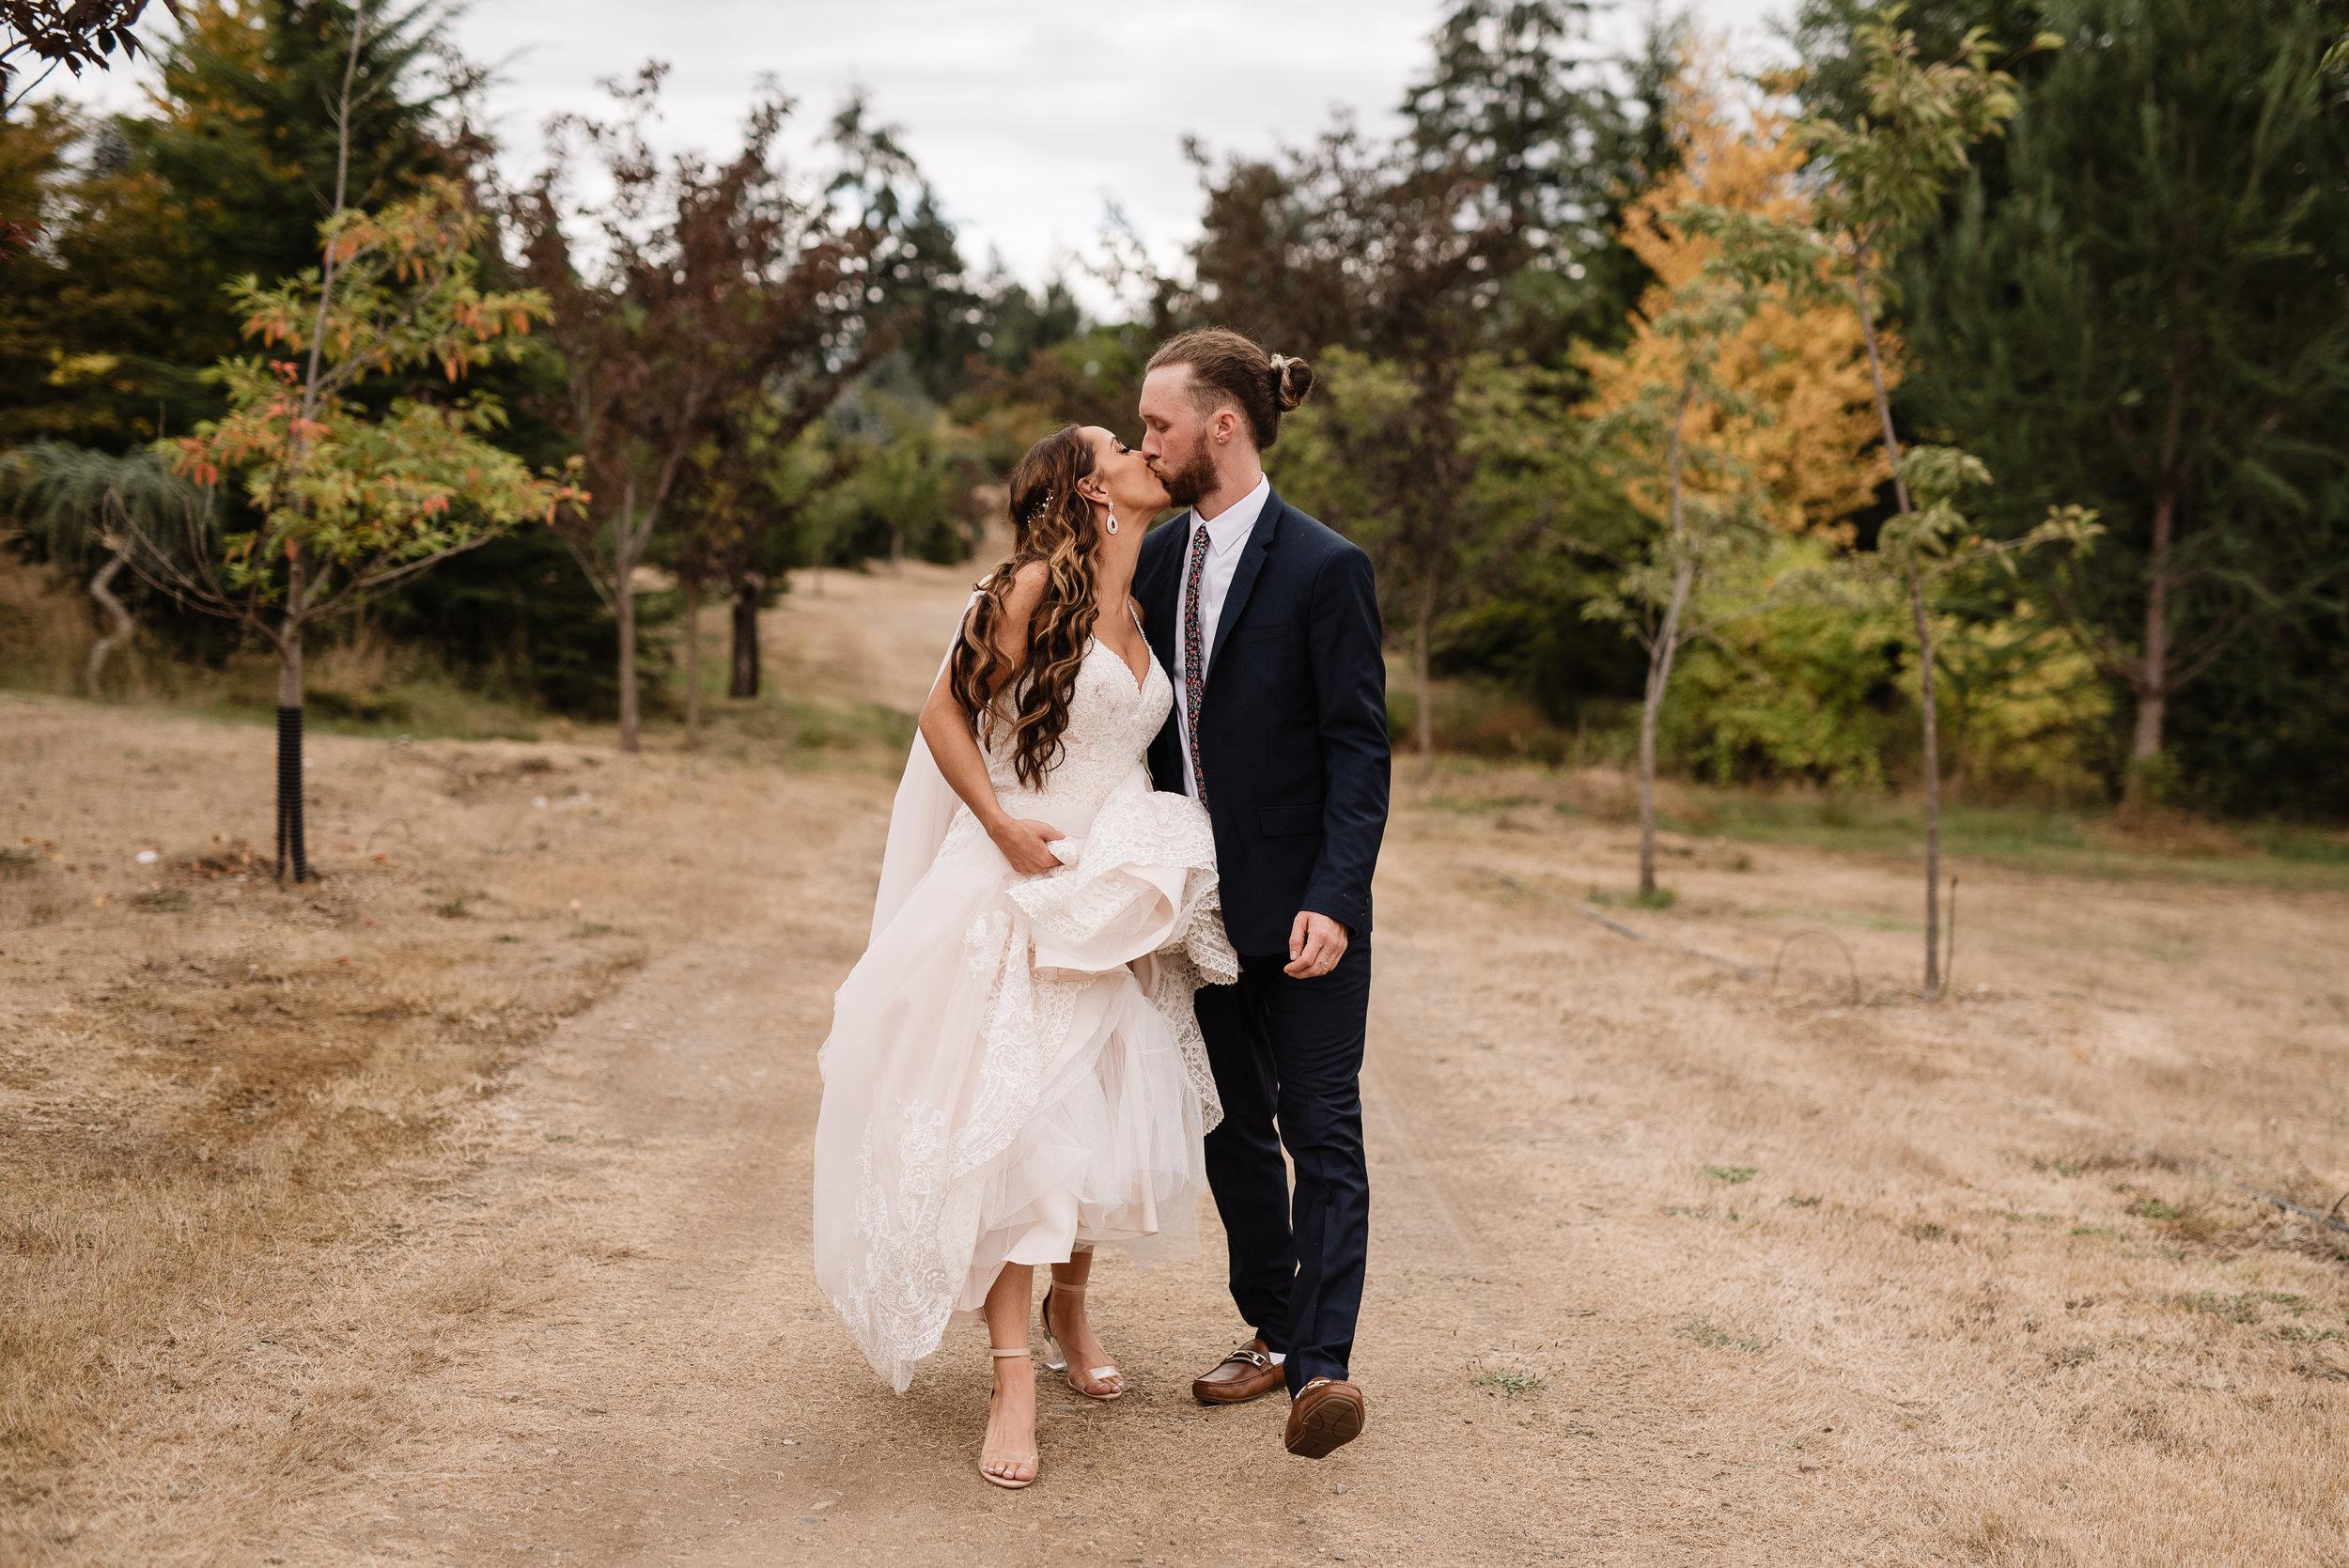 oklahoma wedding photographer bride groom wedding day outside seattle overcast walking wedding portrait lifestyle